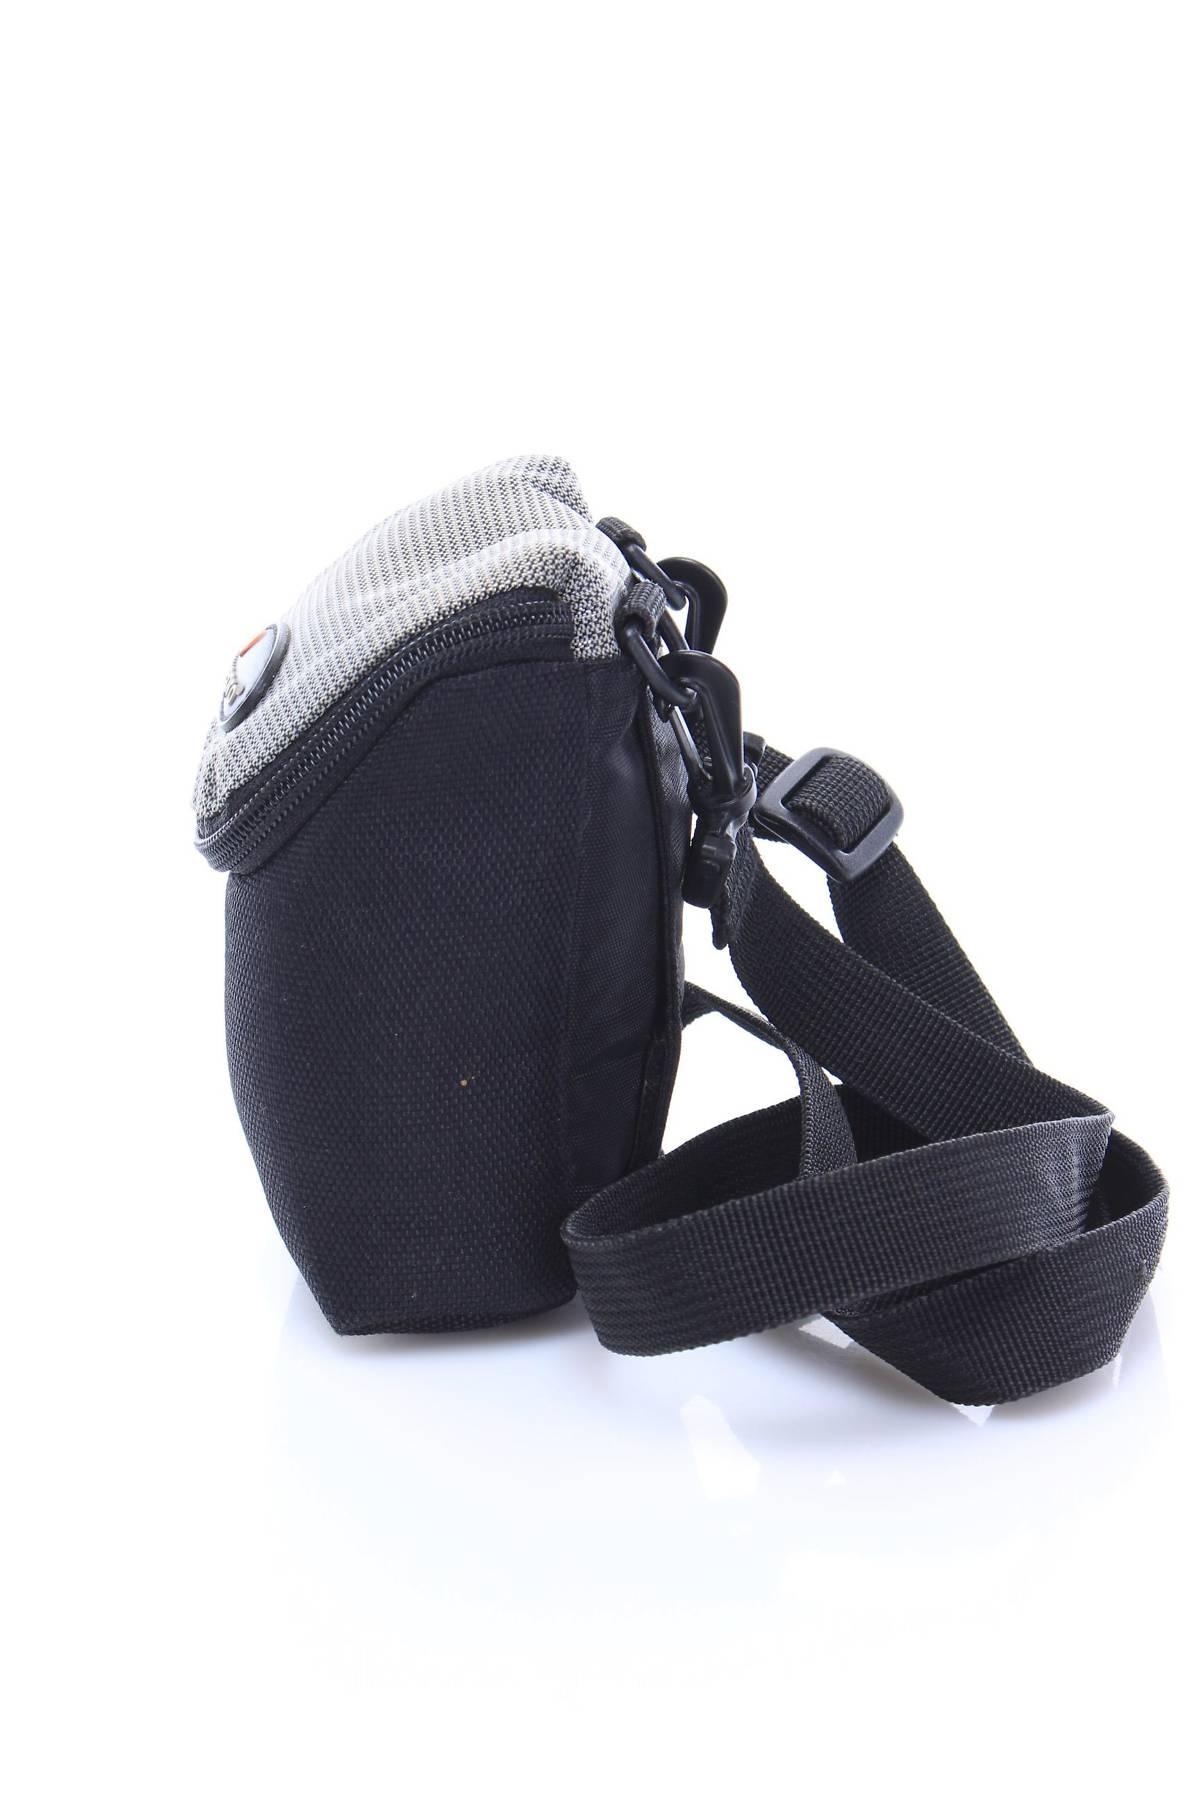 Чанта за фотоапарат Lowepro5